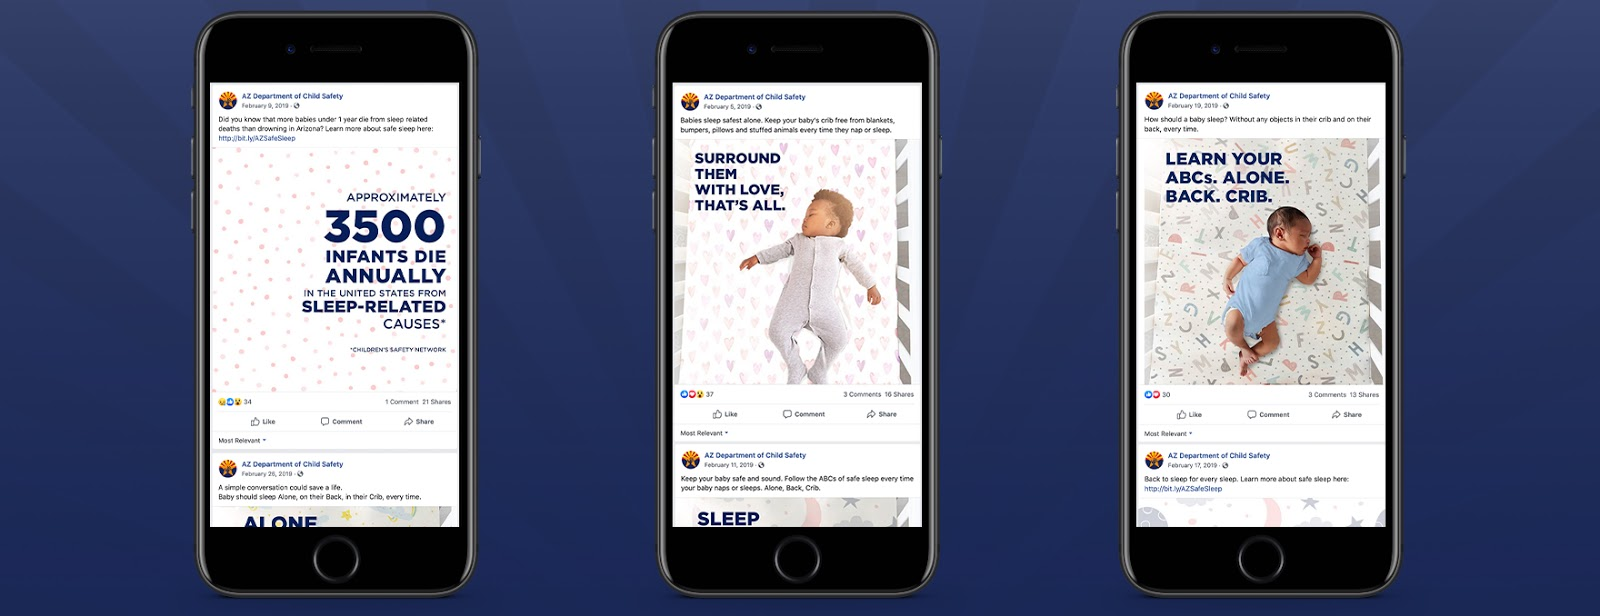 Social Media for Government Marketing